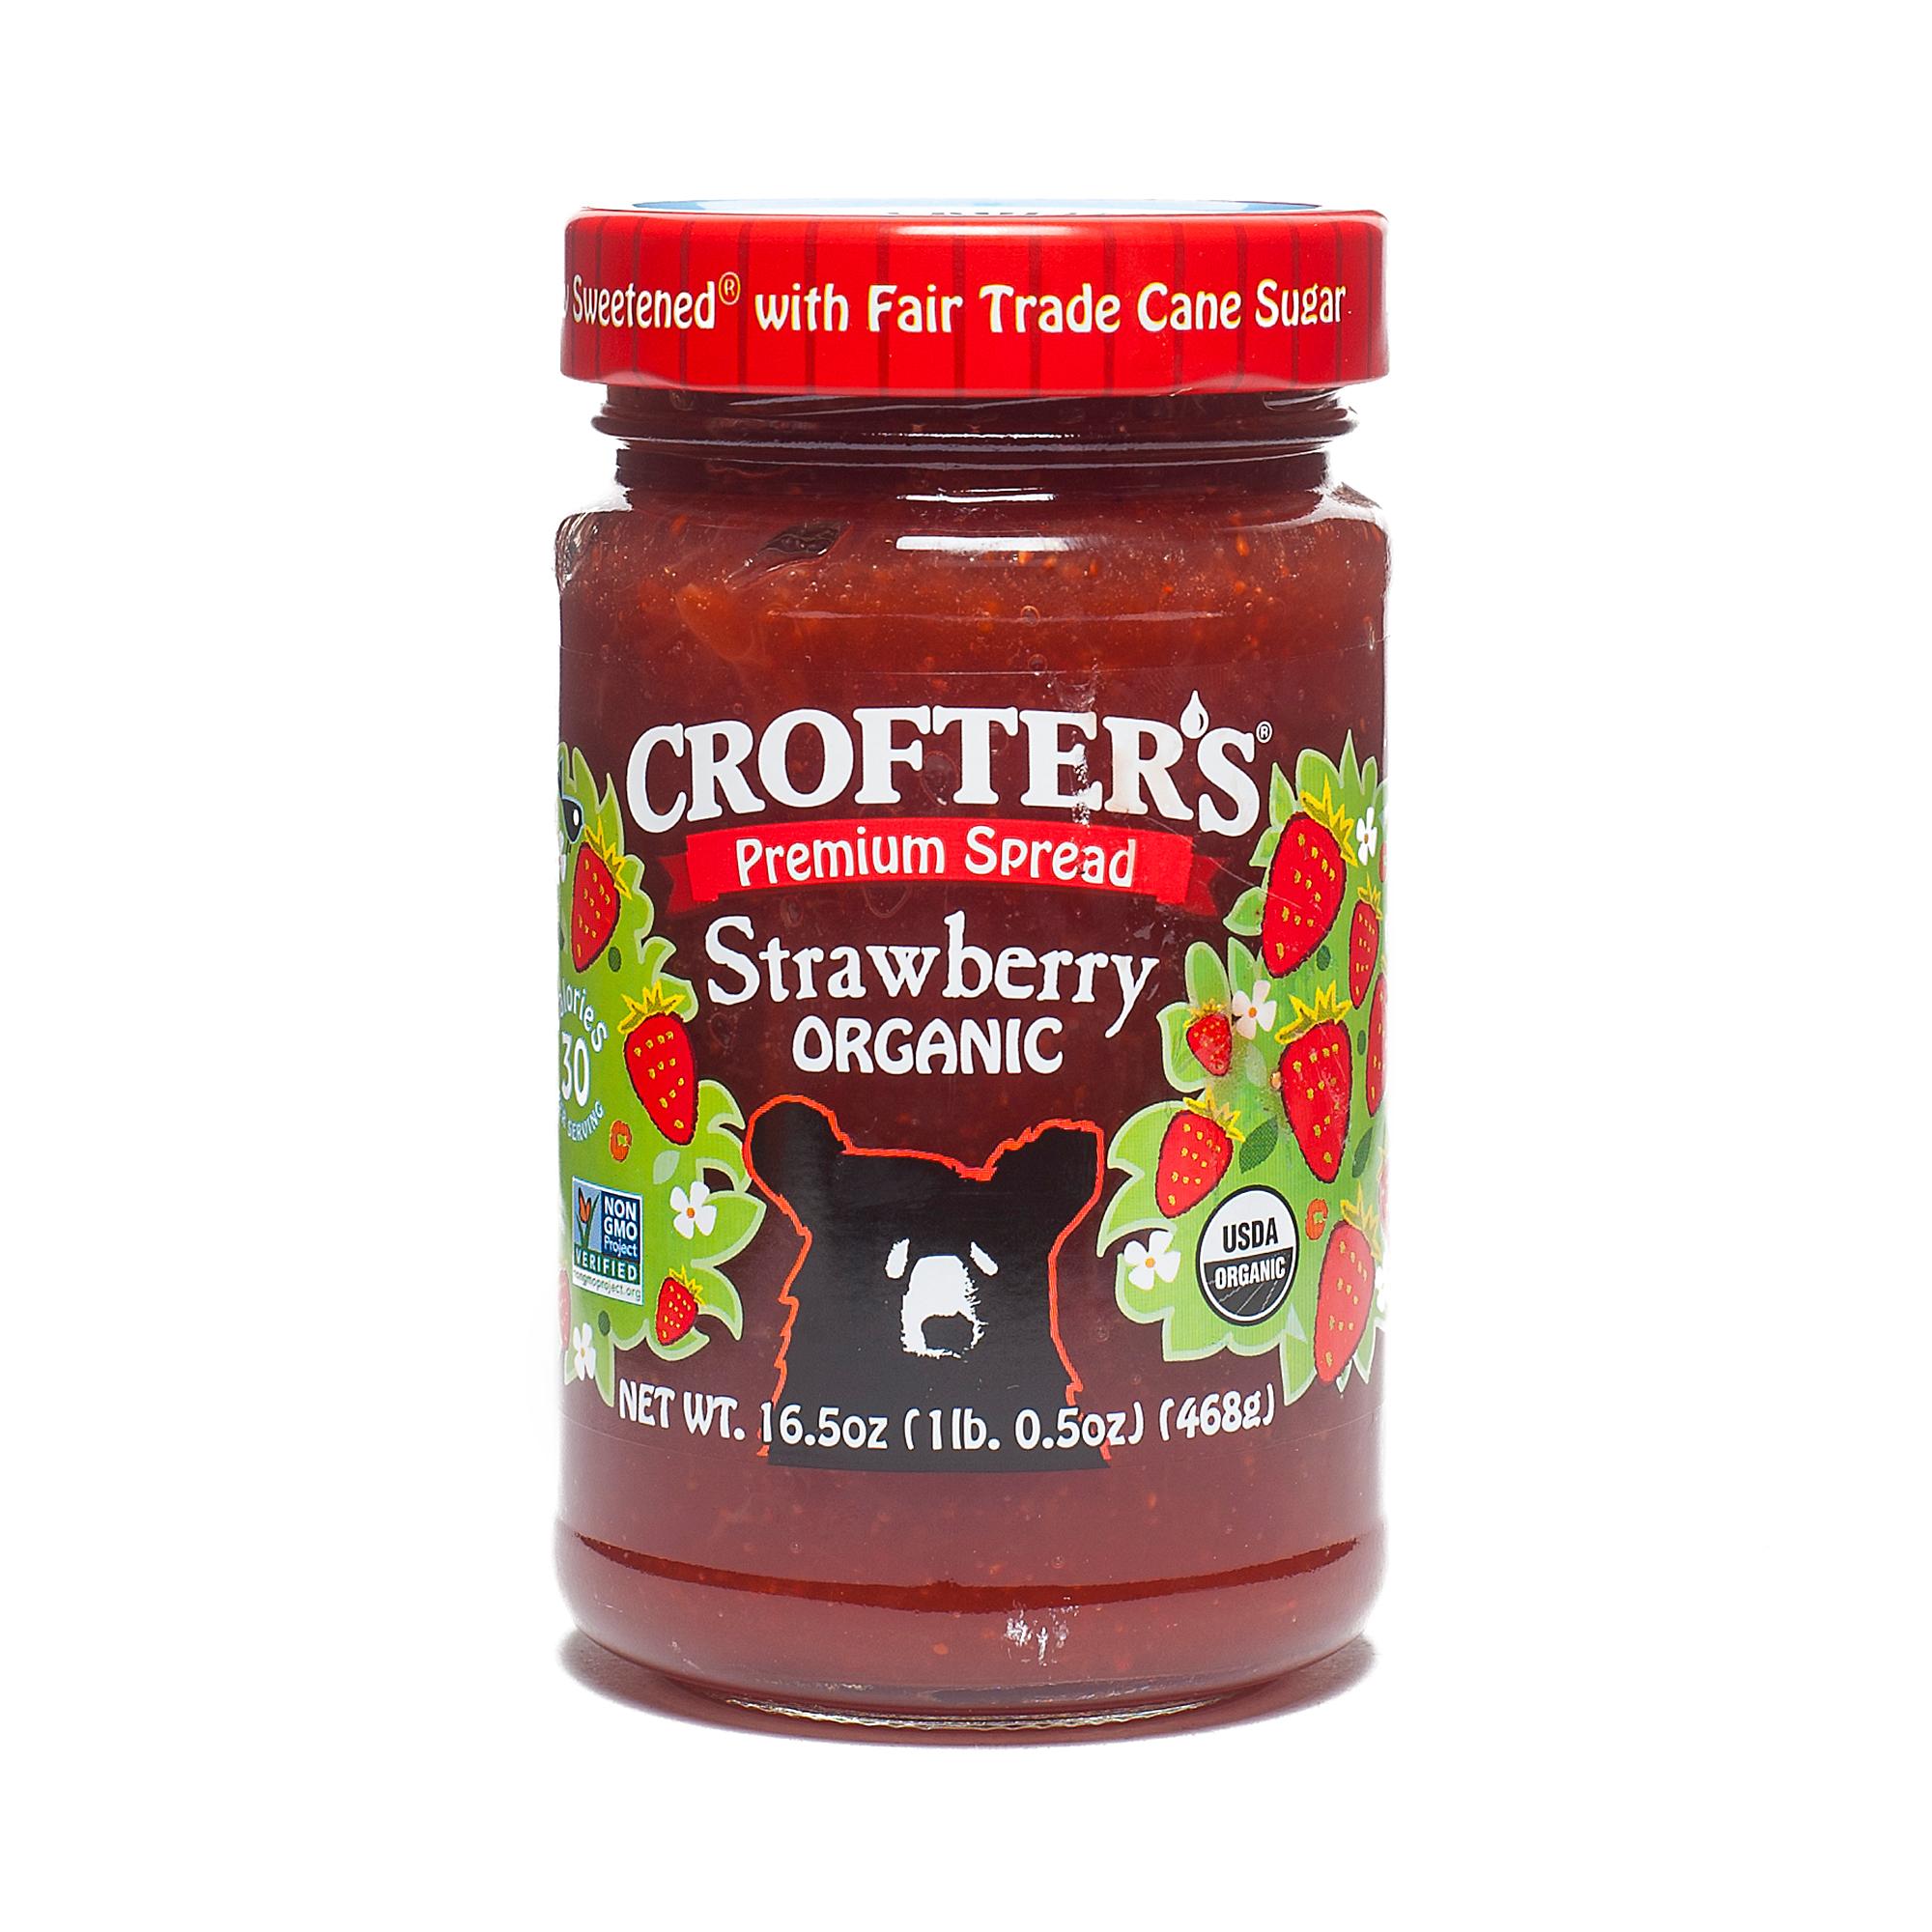 Crofters Organic Strawberry Jam 16.5 oz jar